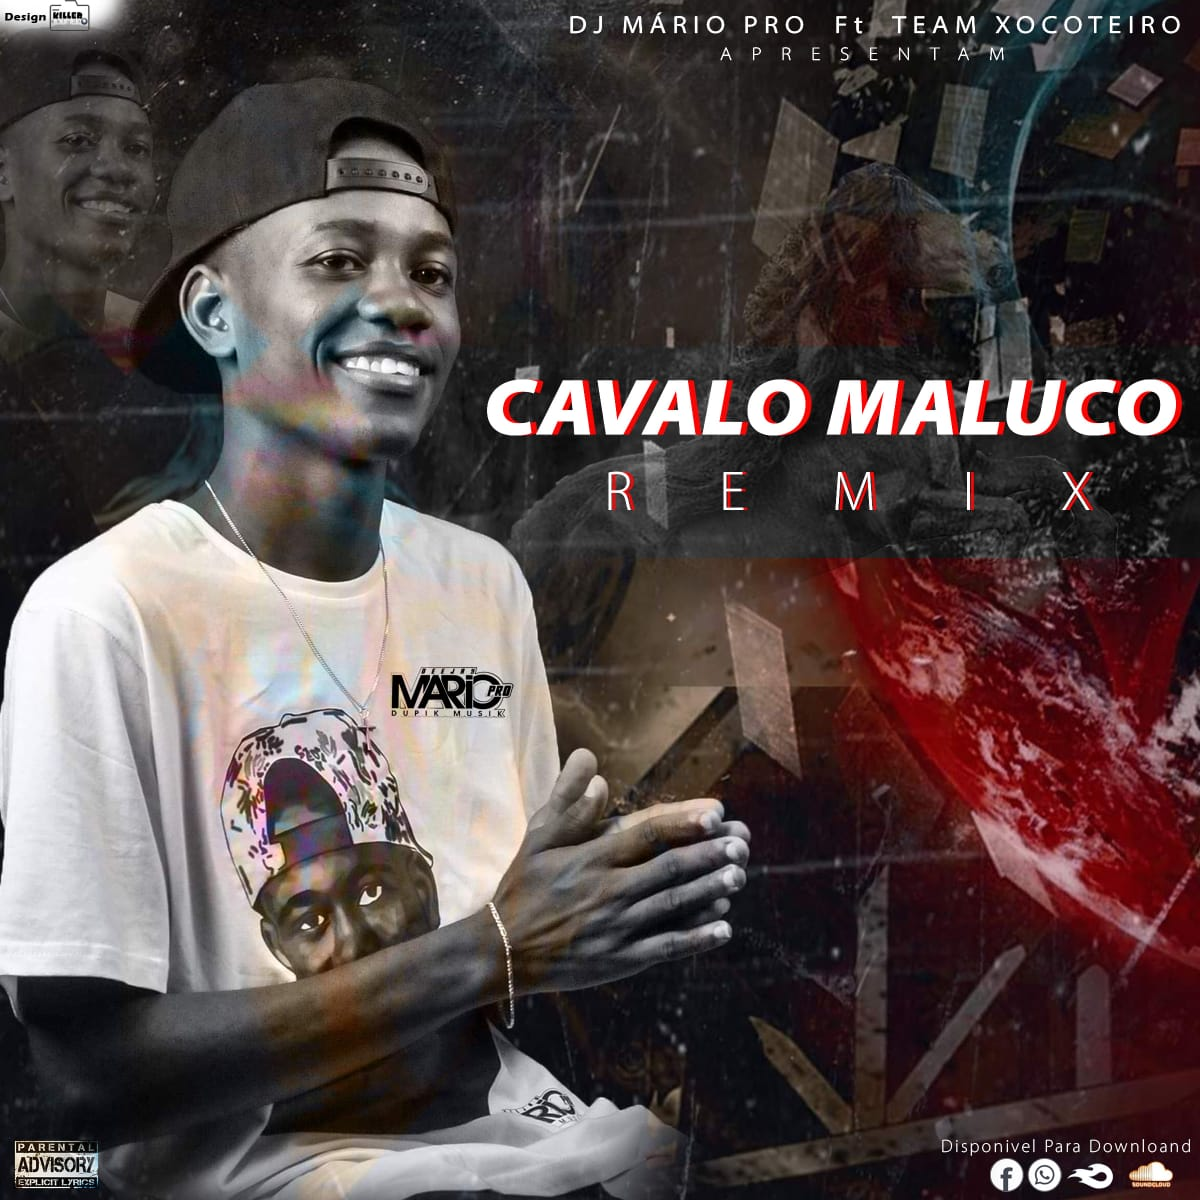 Dj Mário Pro - Cavalo Maluco (Remix) (feat. Team Xocoteiro)